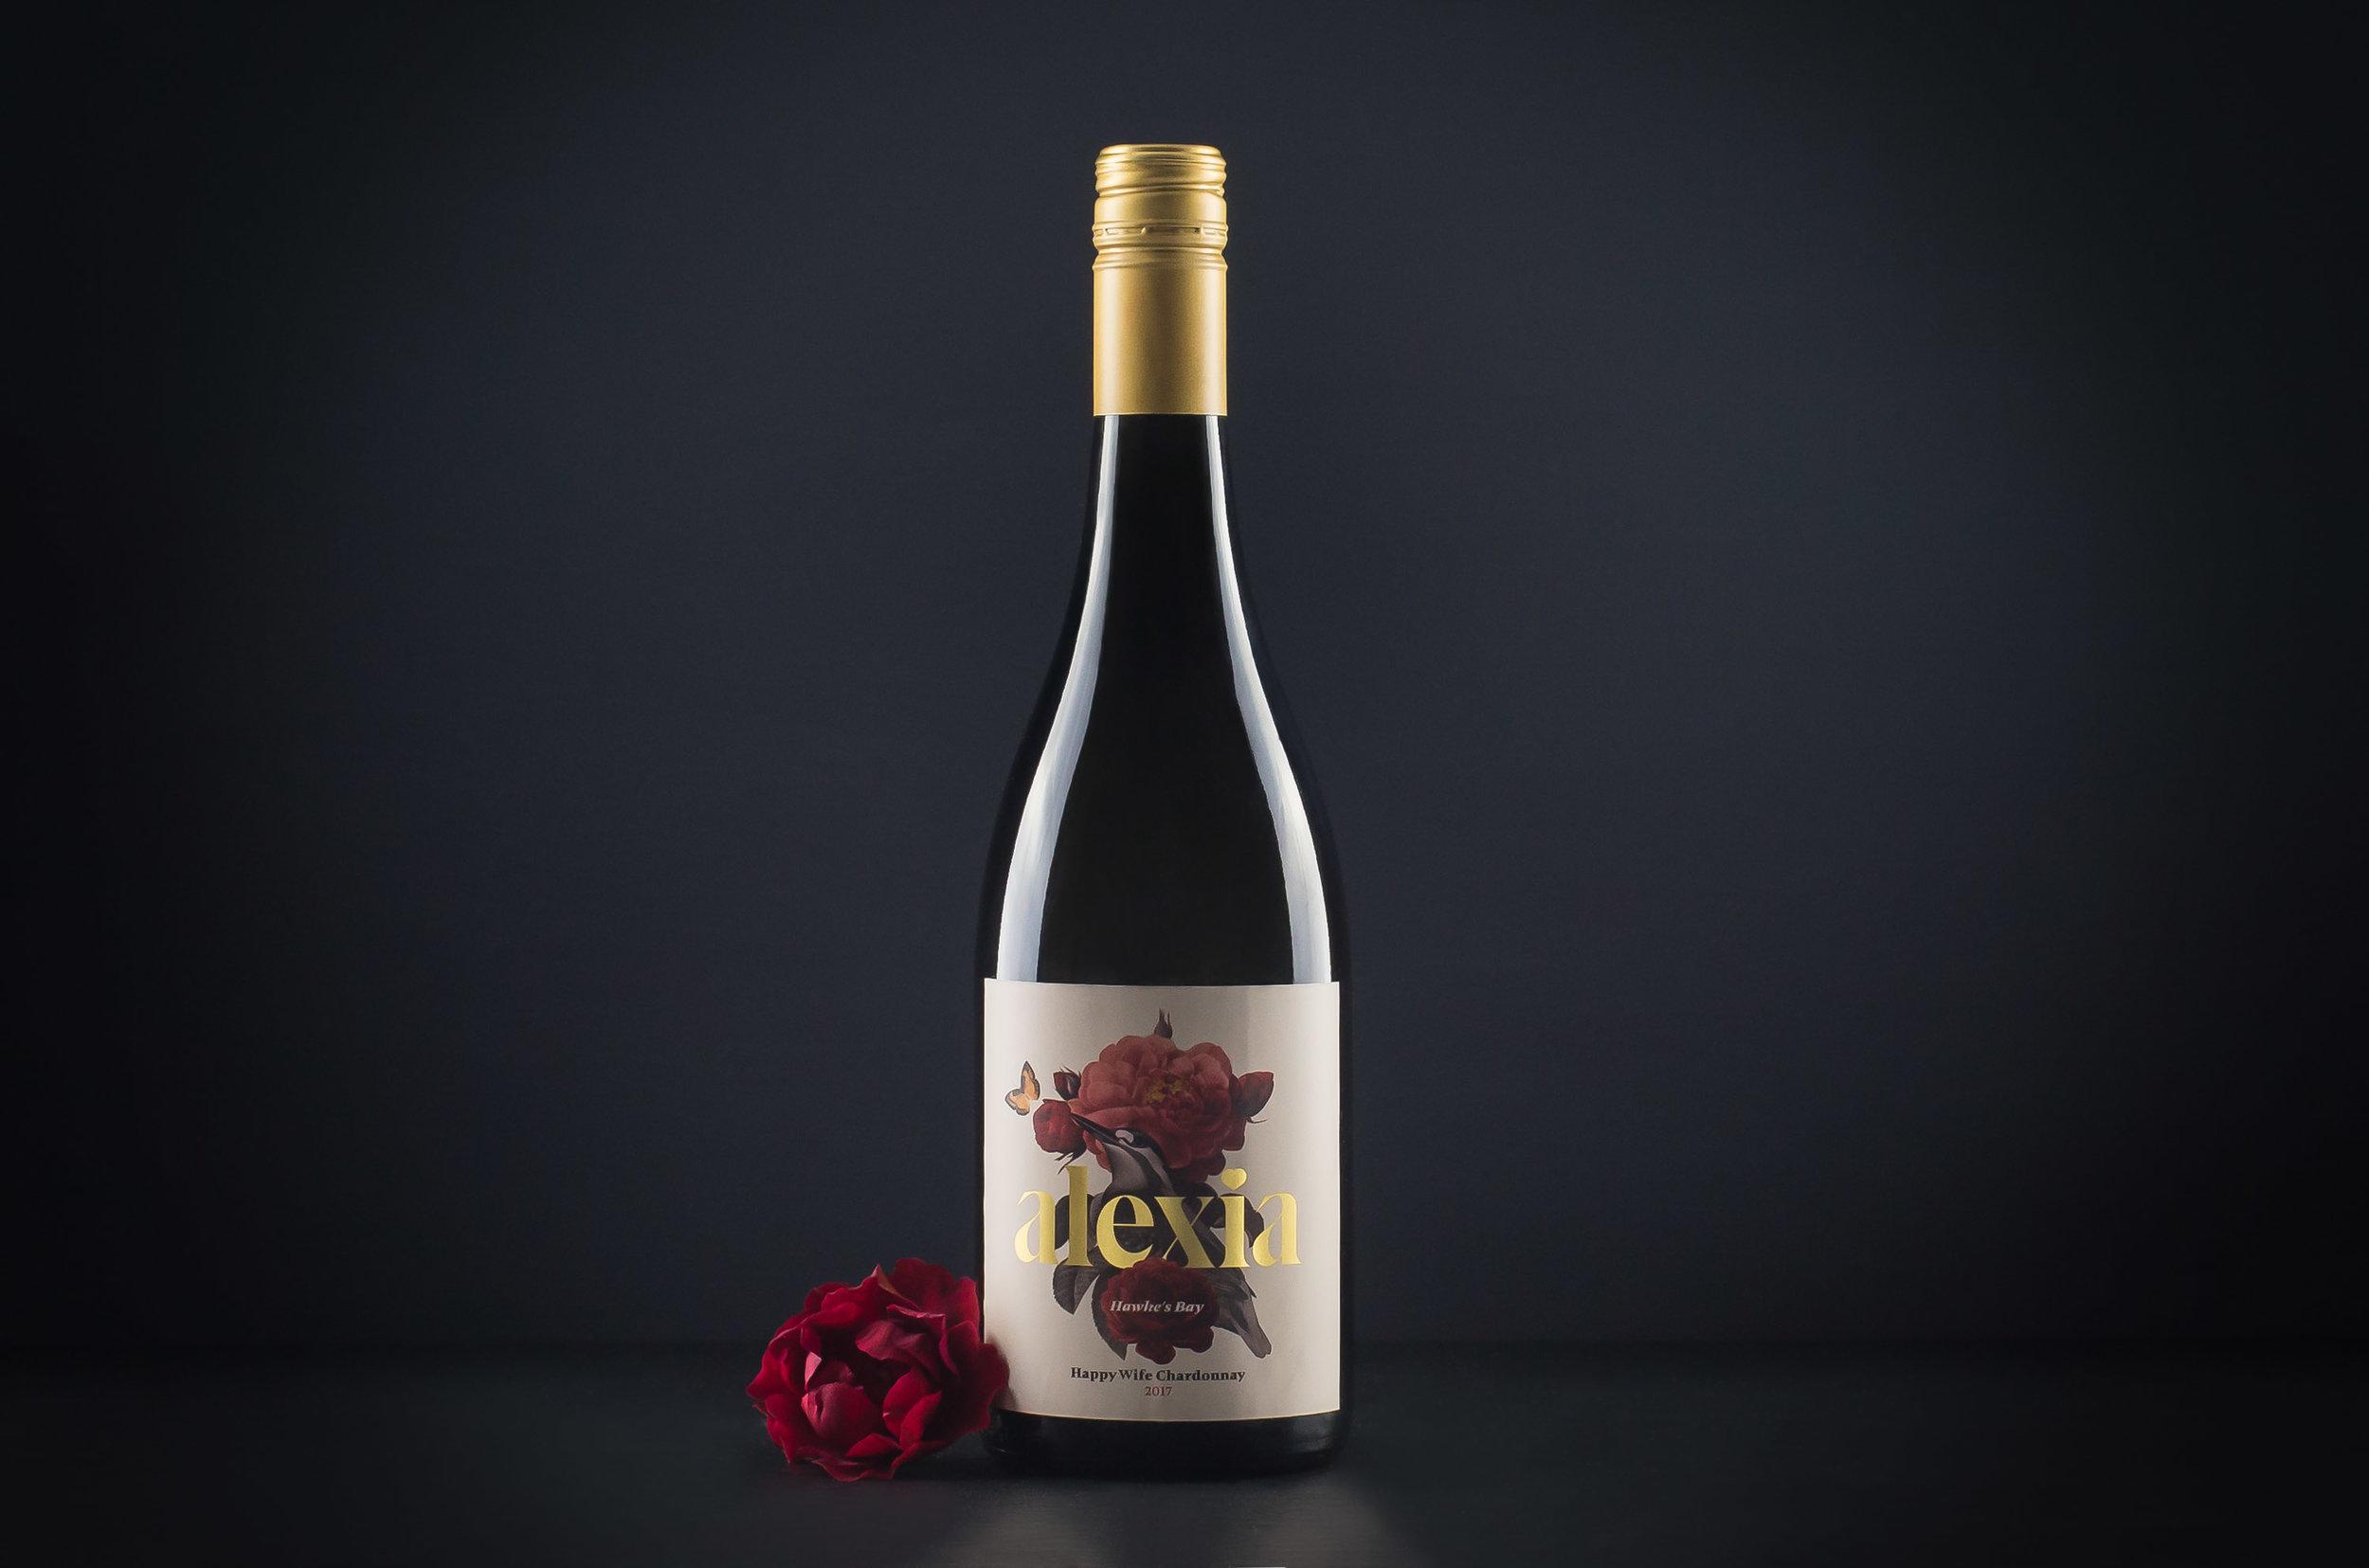 alexia wine bottle commercial photographer wairarapa.jpg